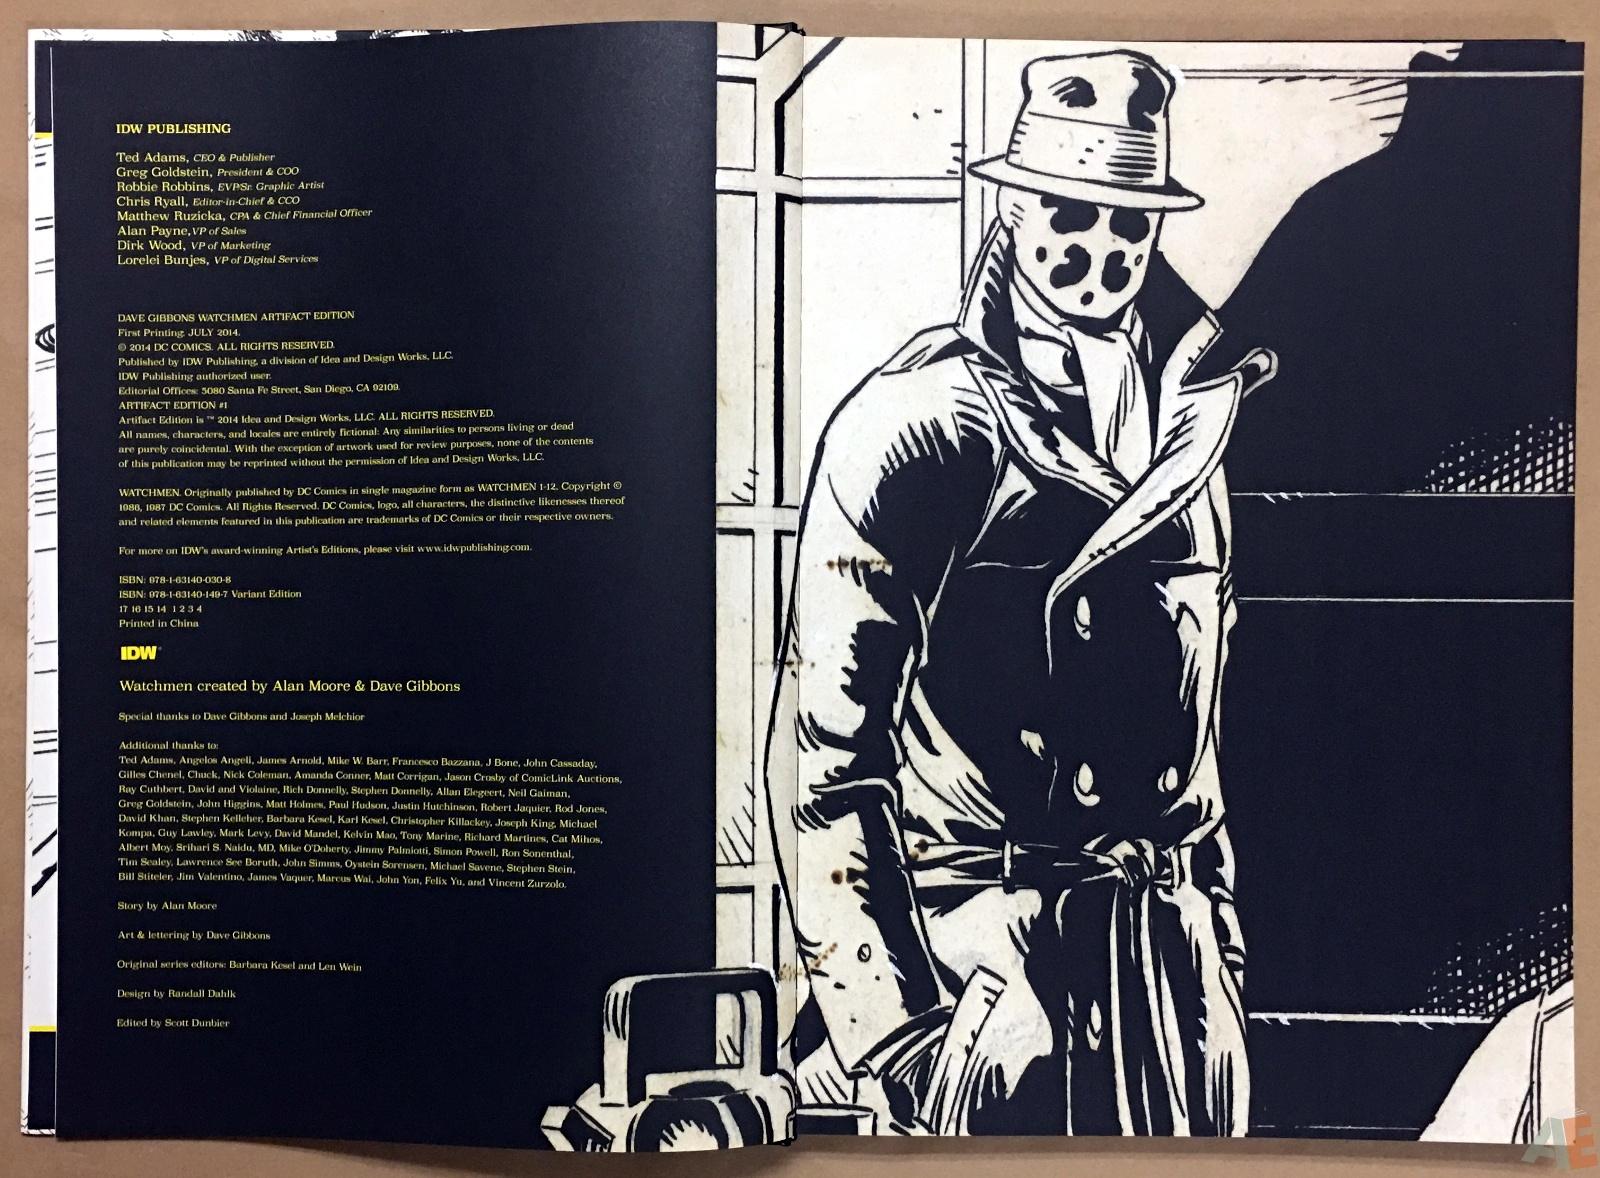 Dave Gibbons Watchmen Artifact Edition 4